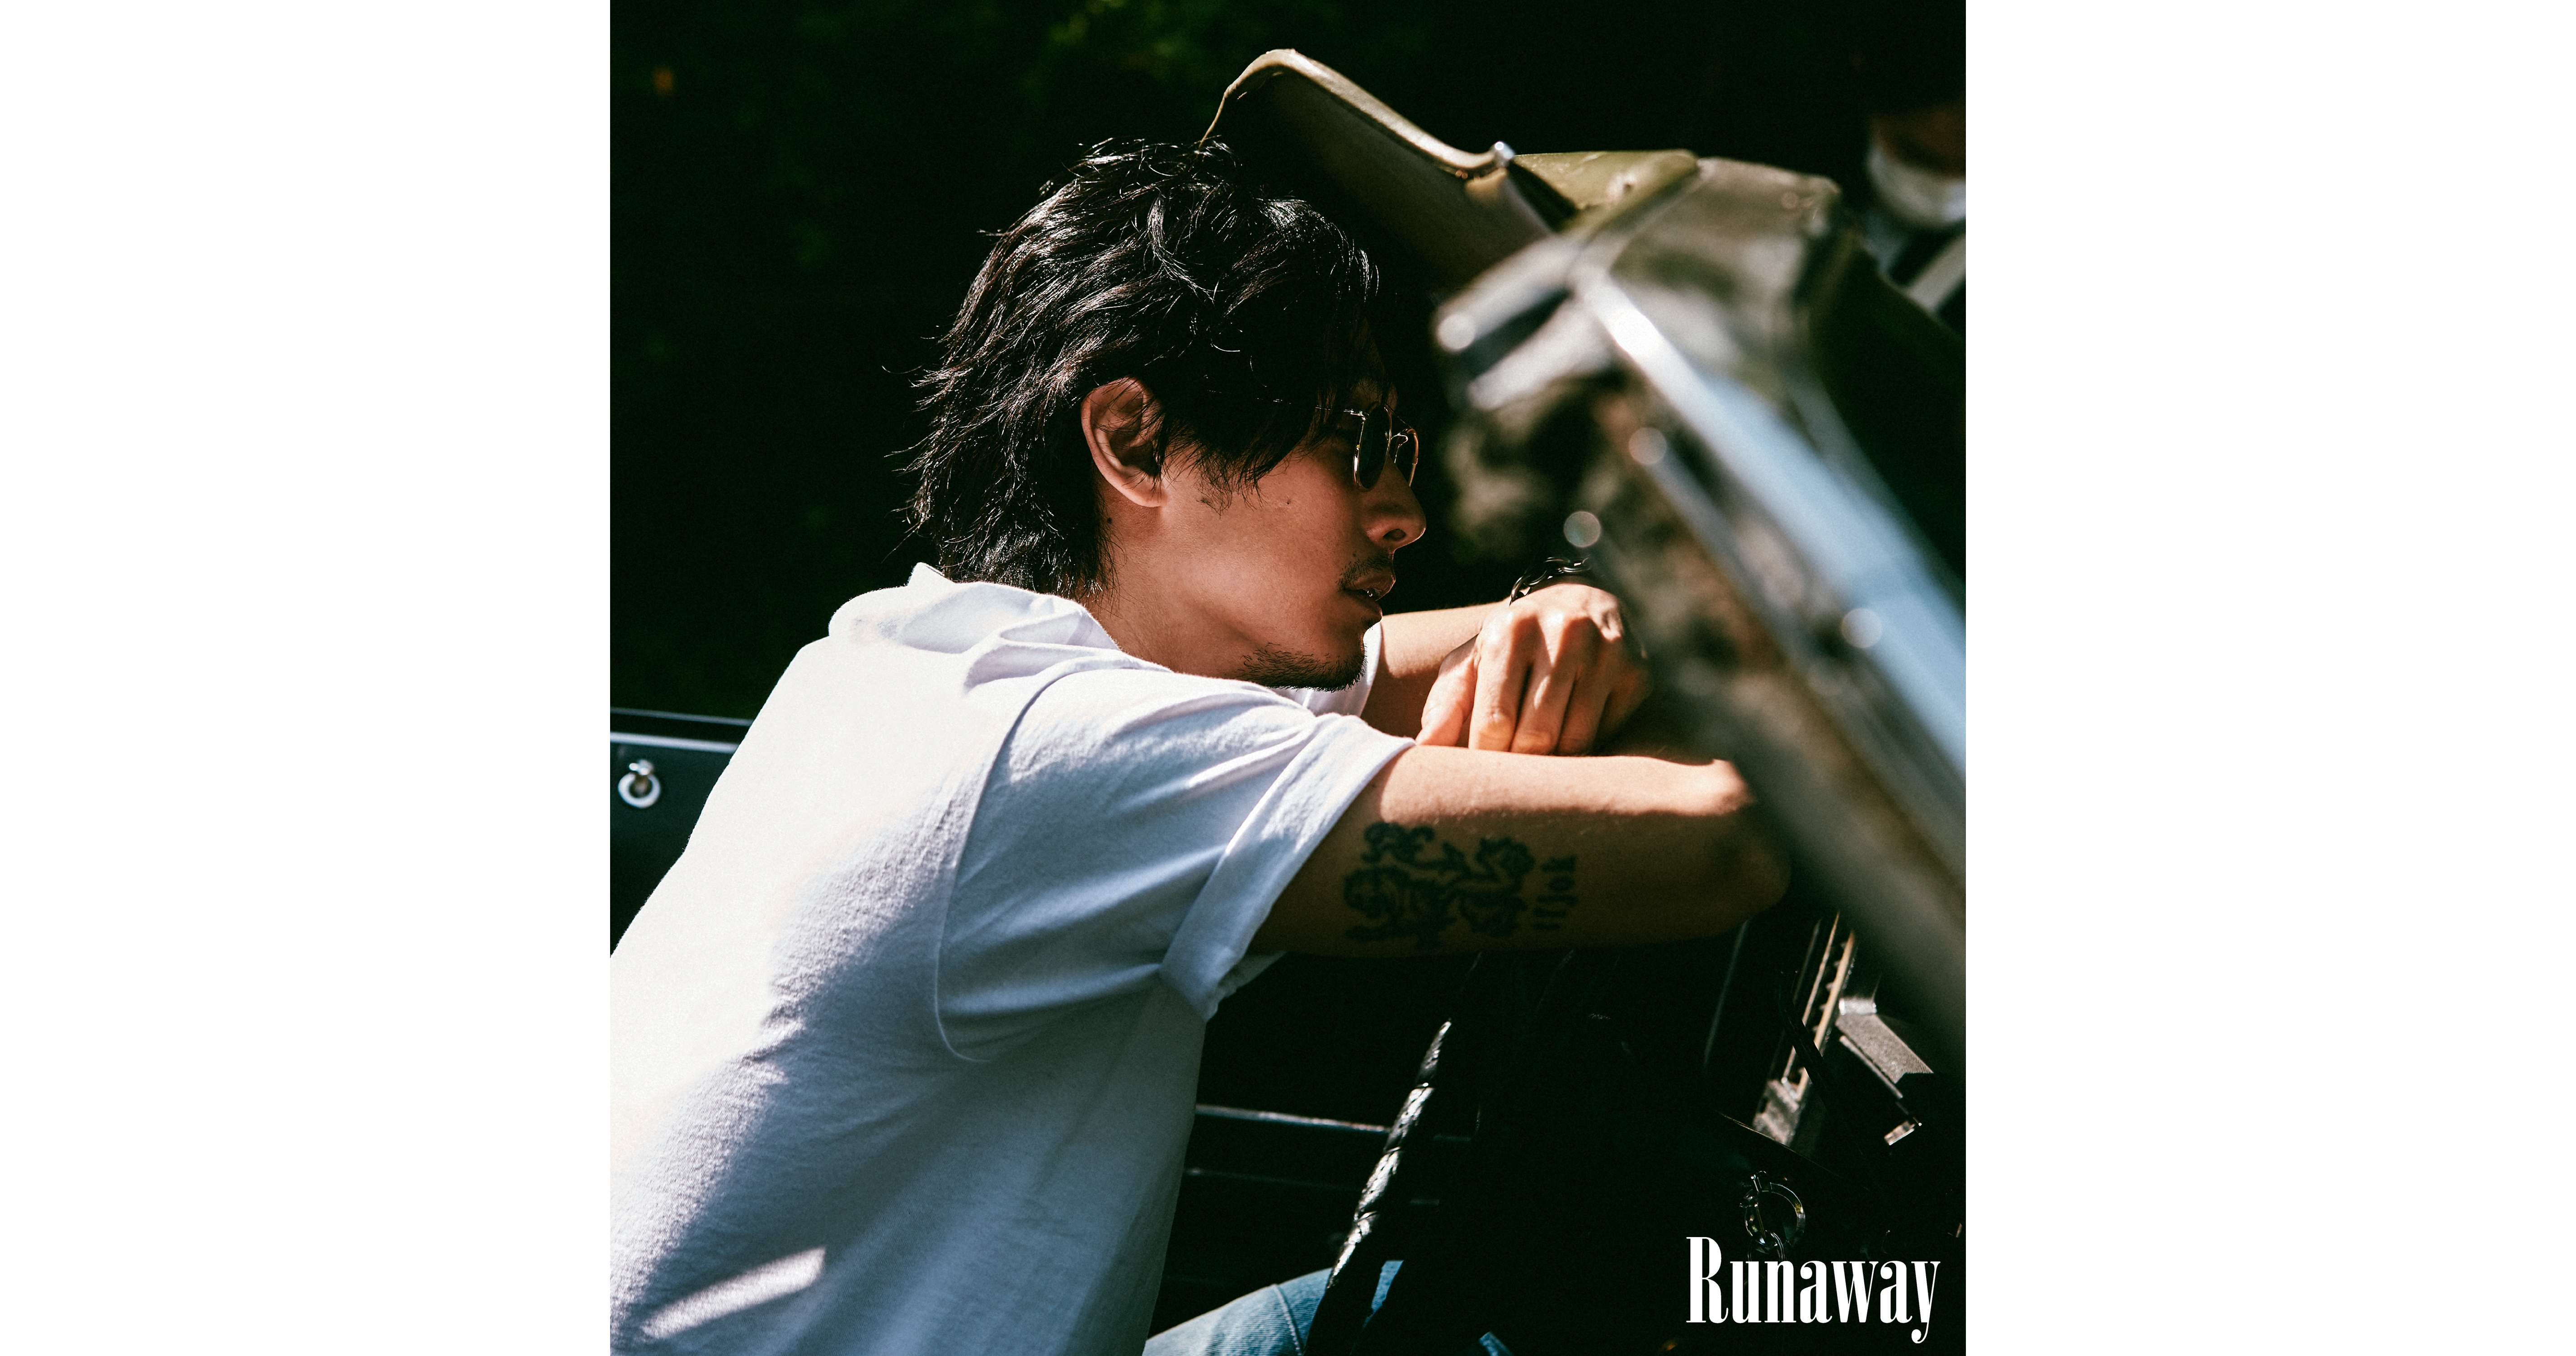 Dean_Runaway